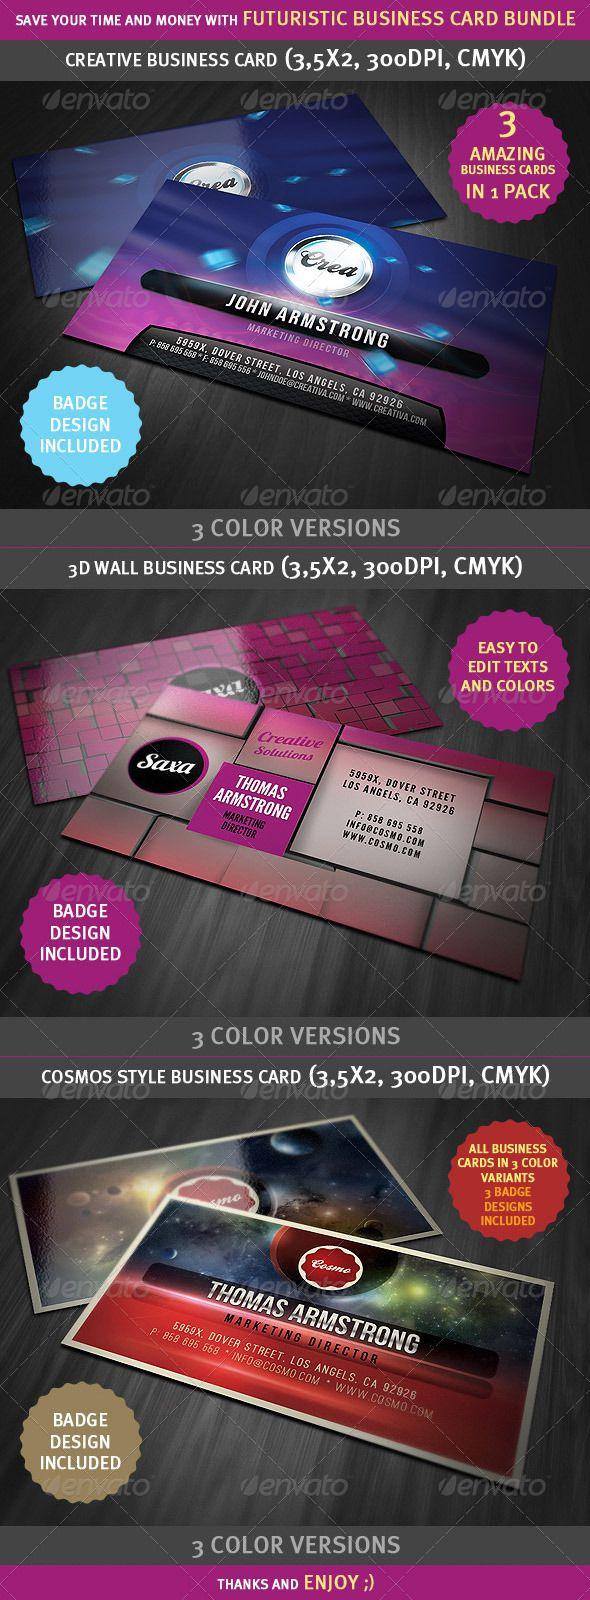 Futuristic And Creative Business Cards Bundle Products I Love